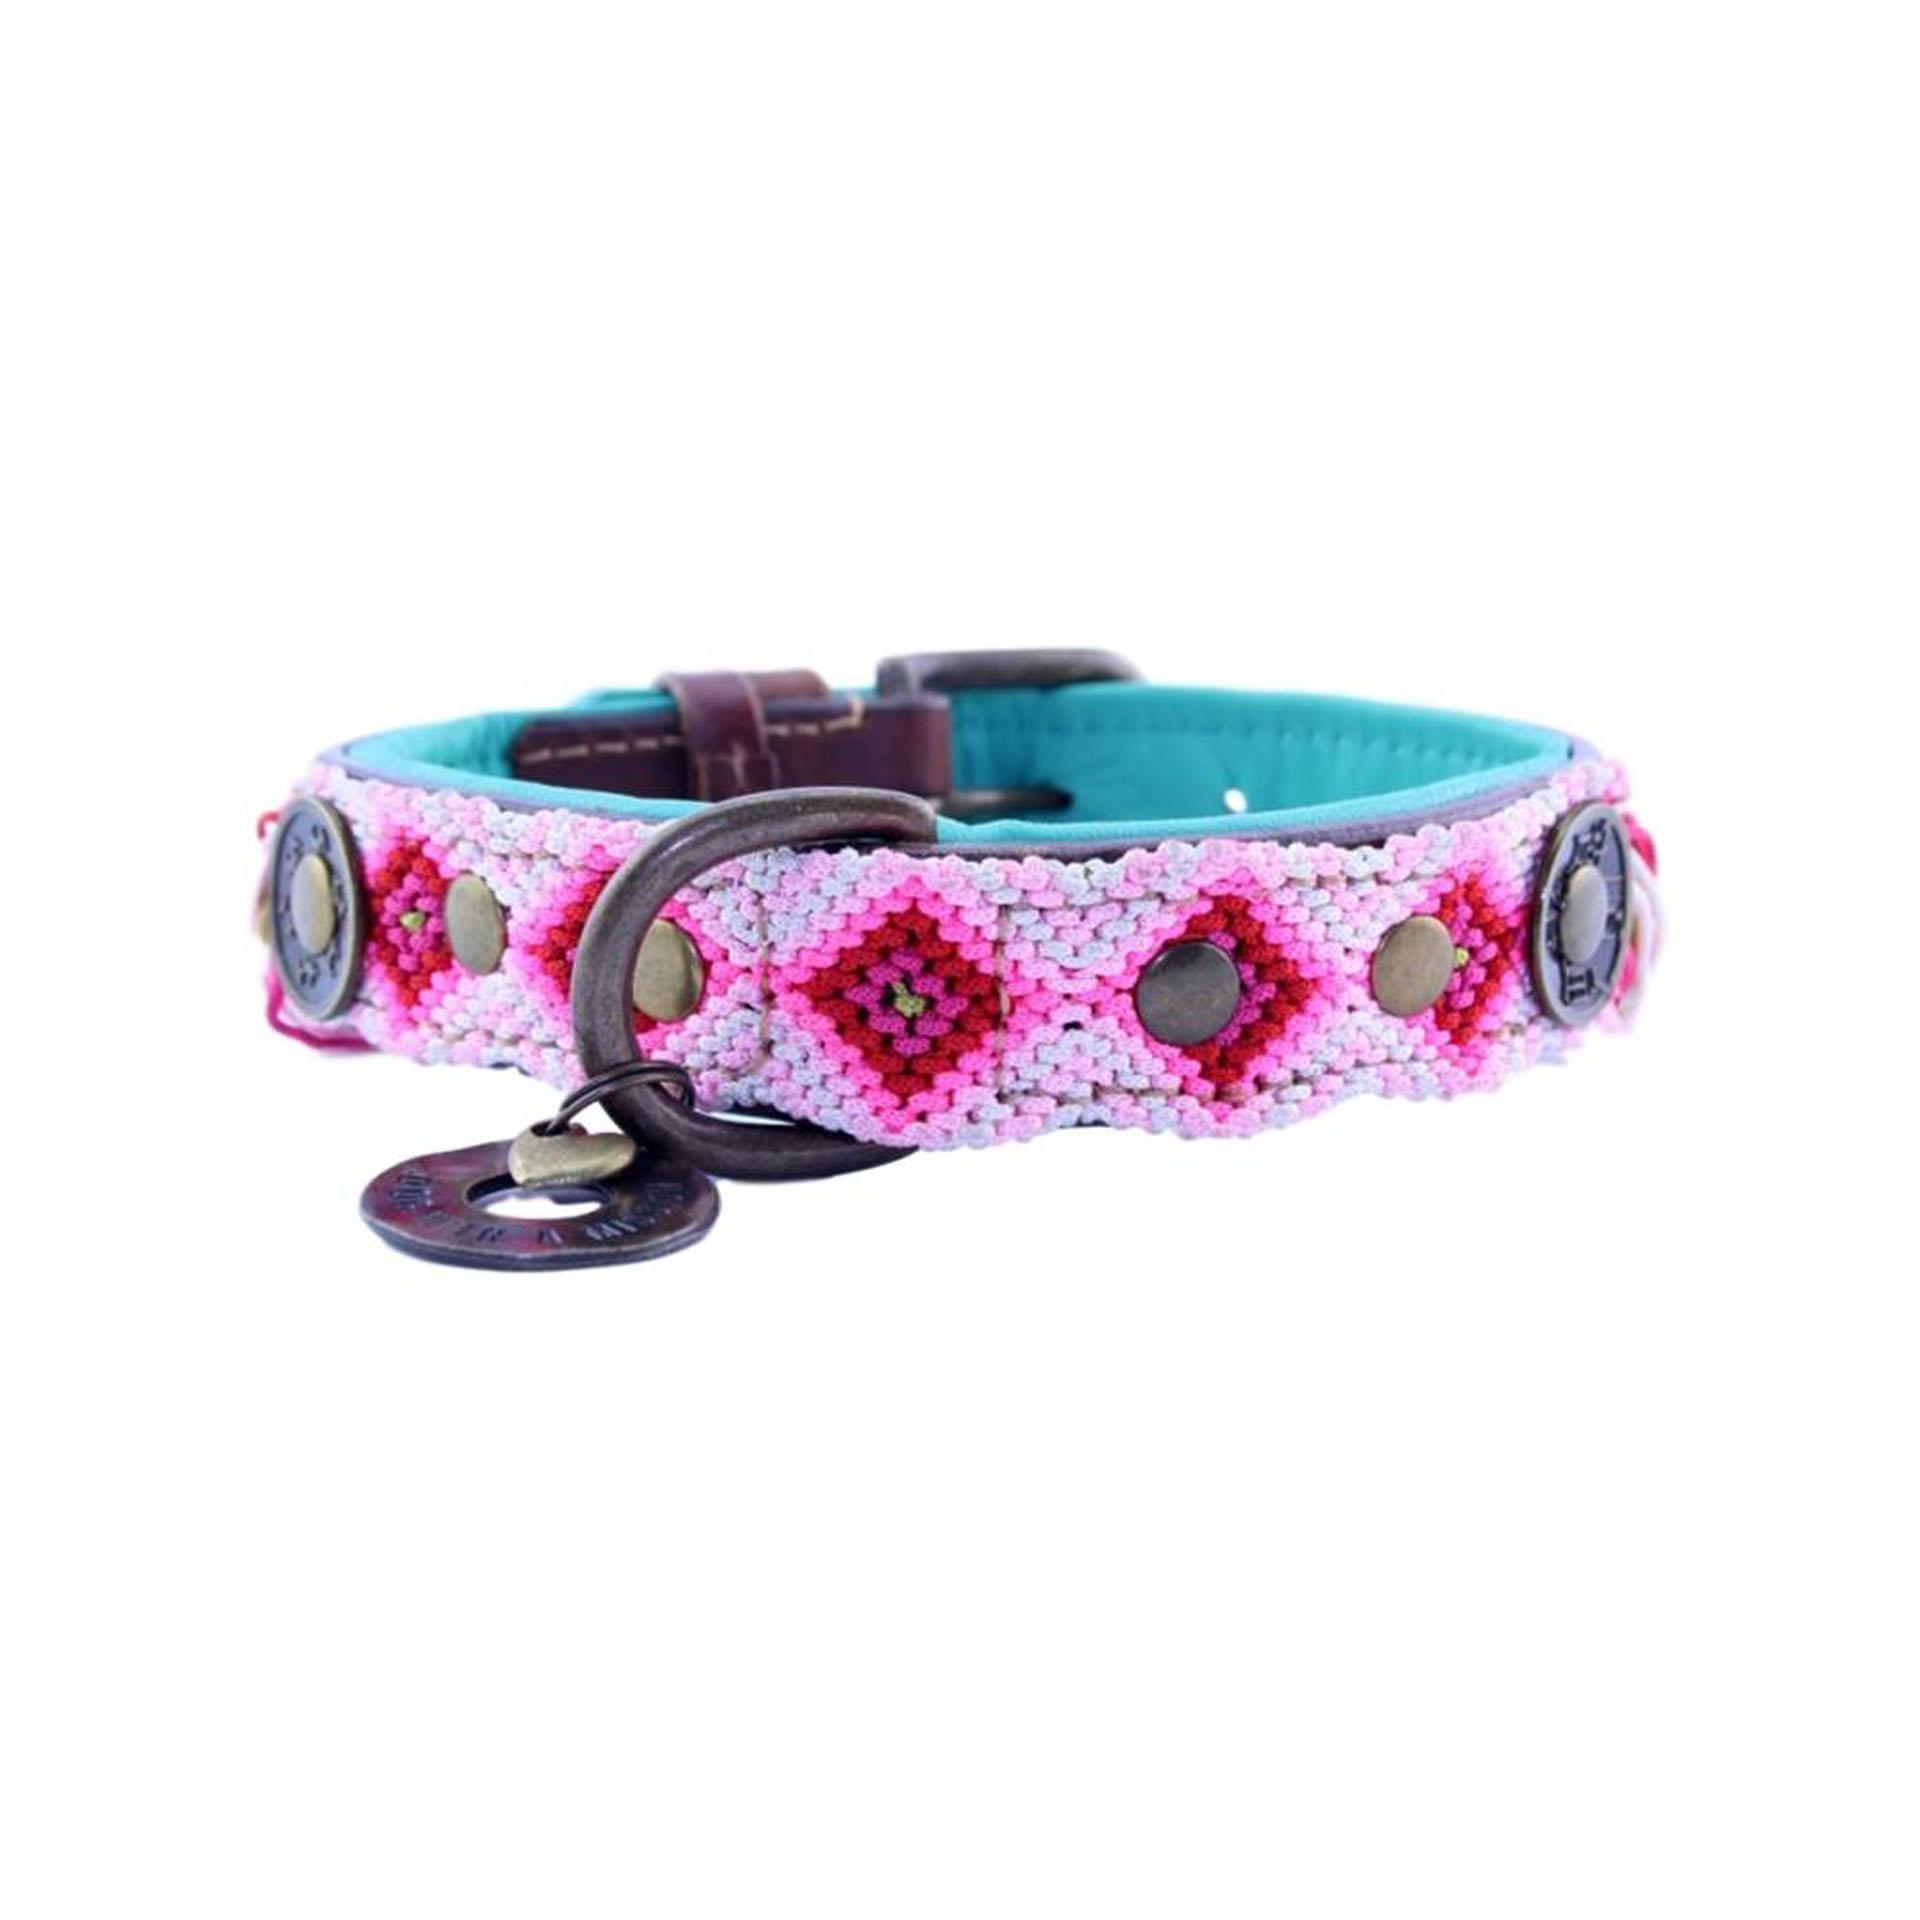 Hundehalsband-dwam-gypsy-lucky-bloom-m